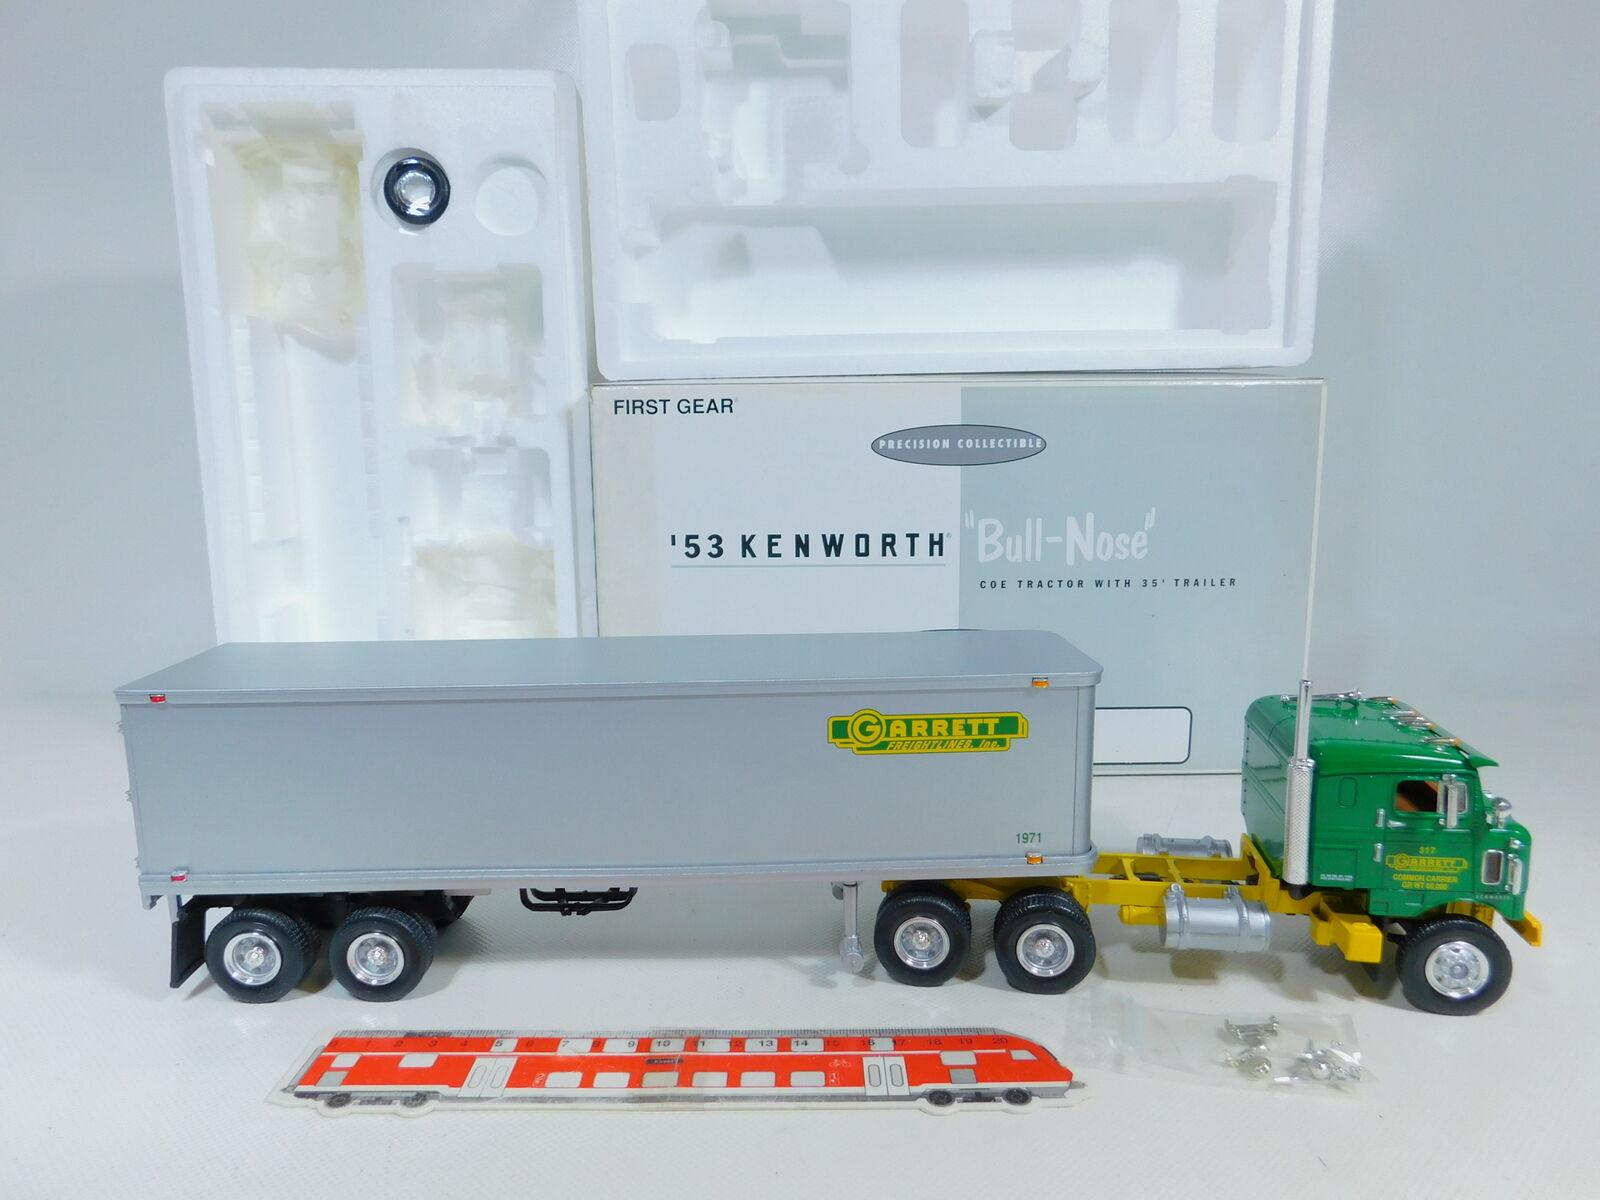 Ca66-3  First Gear 1 34 19-1541 US - USA-camion'53 Kenworth BULL NOSE Garrett, OVP